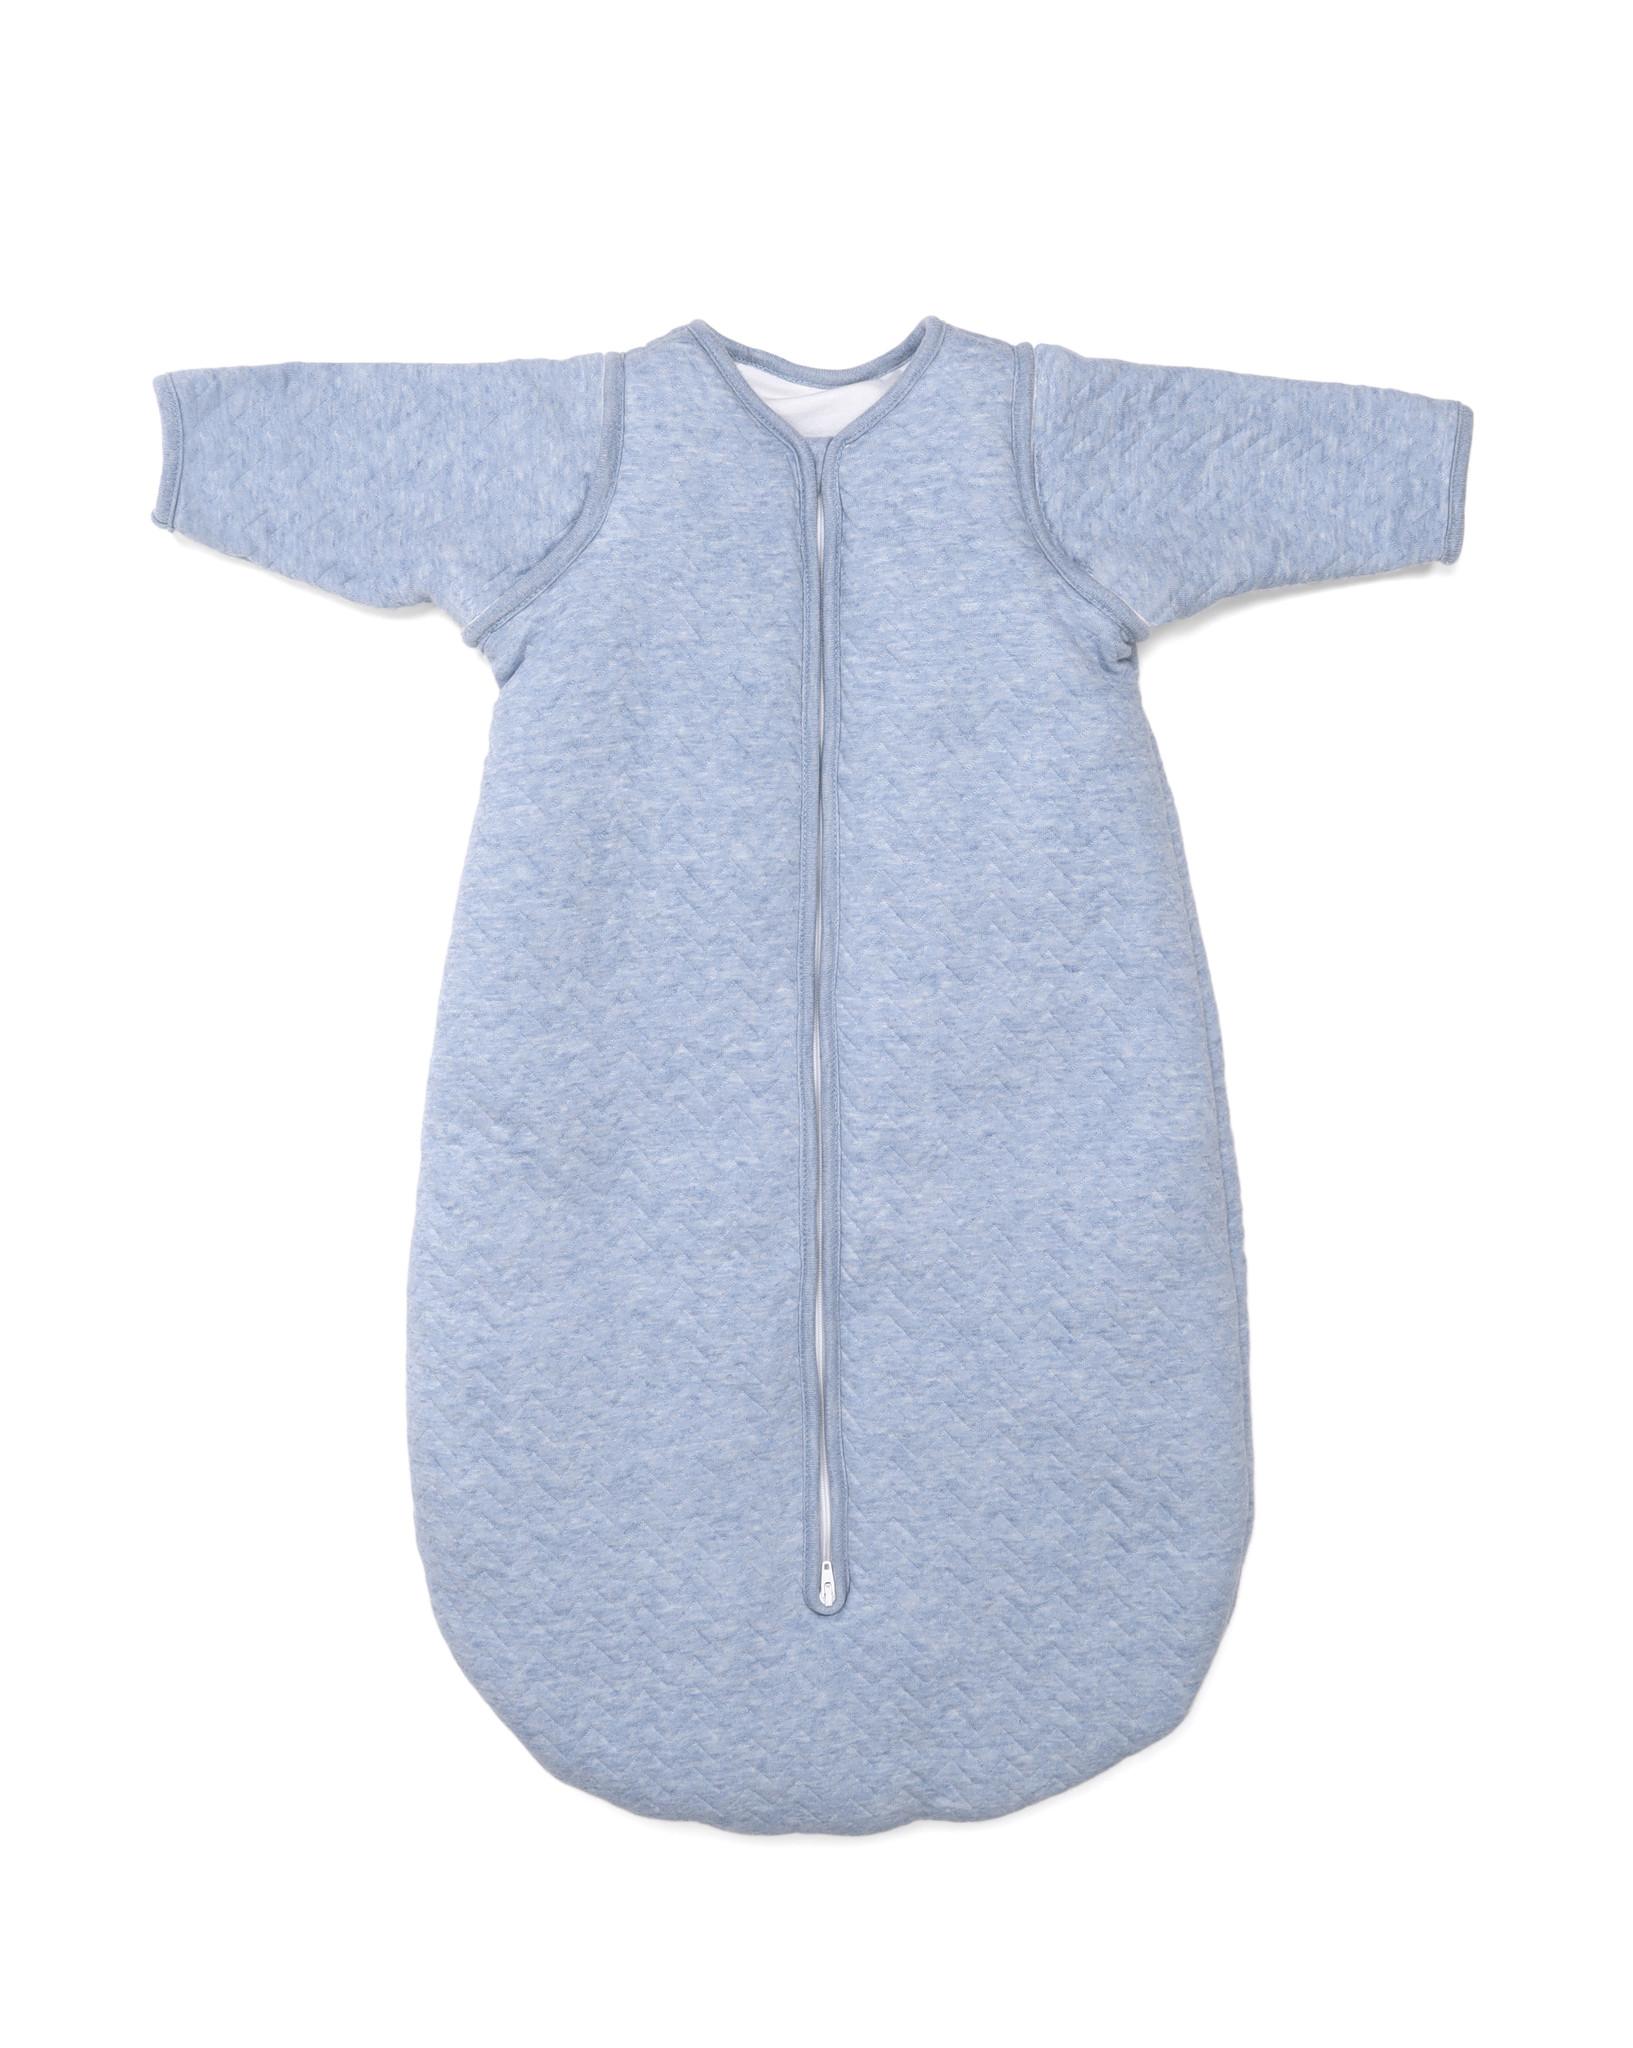 Jersey slaapzak 70cm met afritsbare mouwen Chevron Denim Blue-7